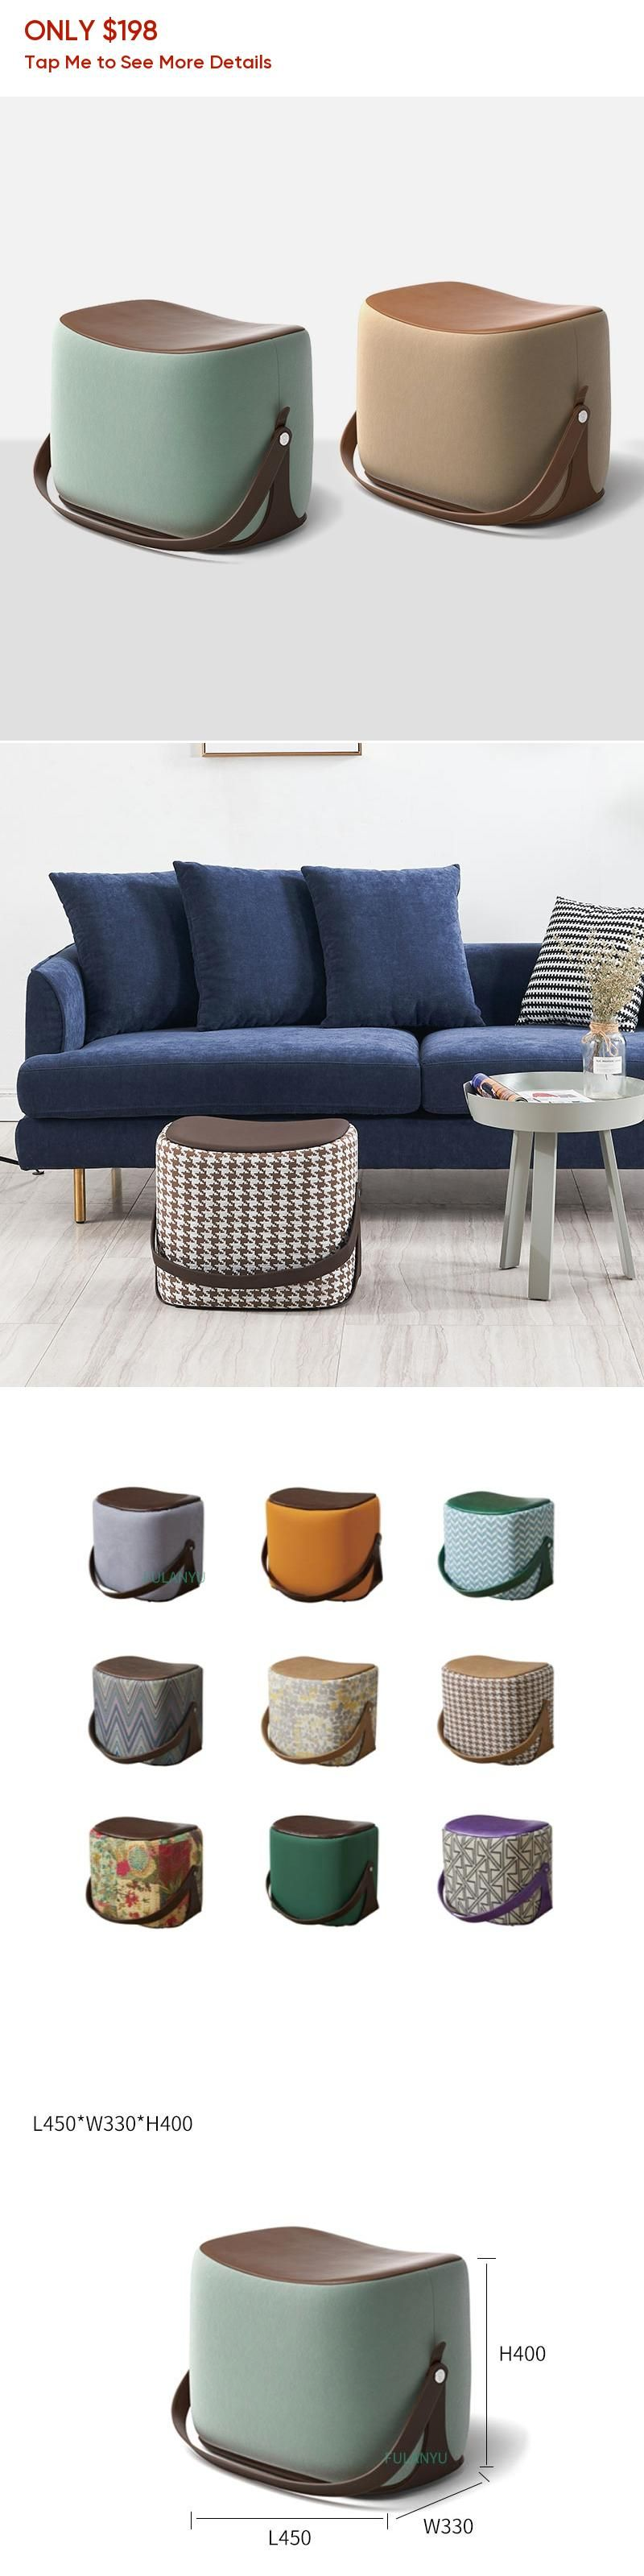 Superb Living Room Chair Sofa Ottoman Makeup Stool Foot Stool Hi Q Dailytribune Chair Design For Home Dailytribuneorg